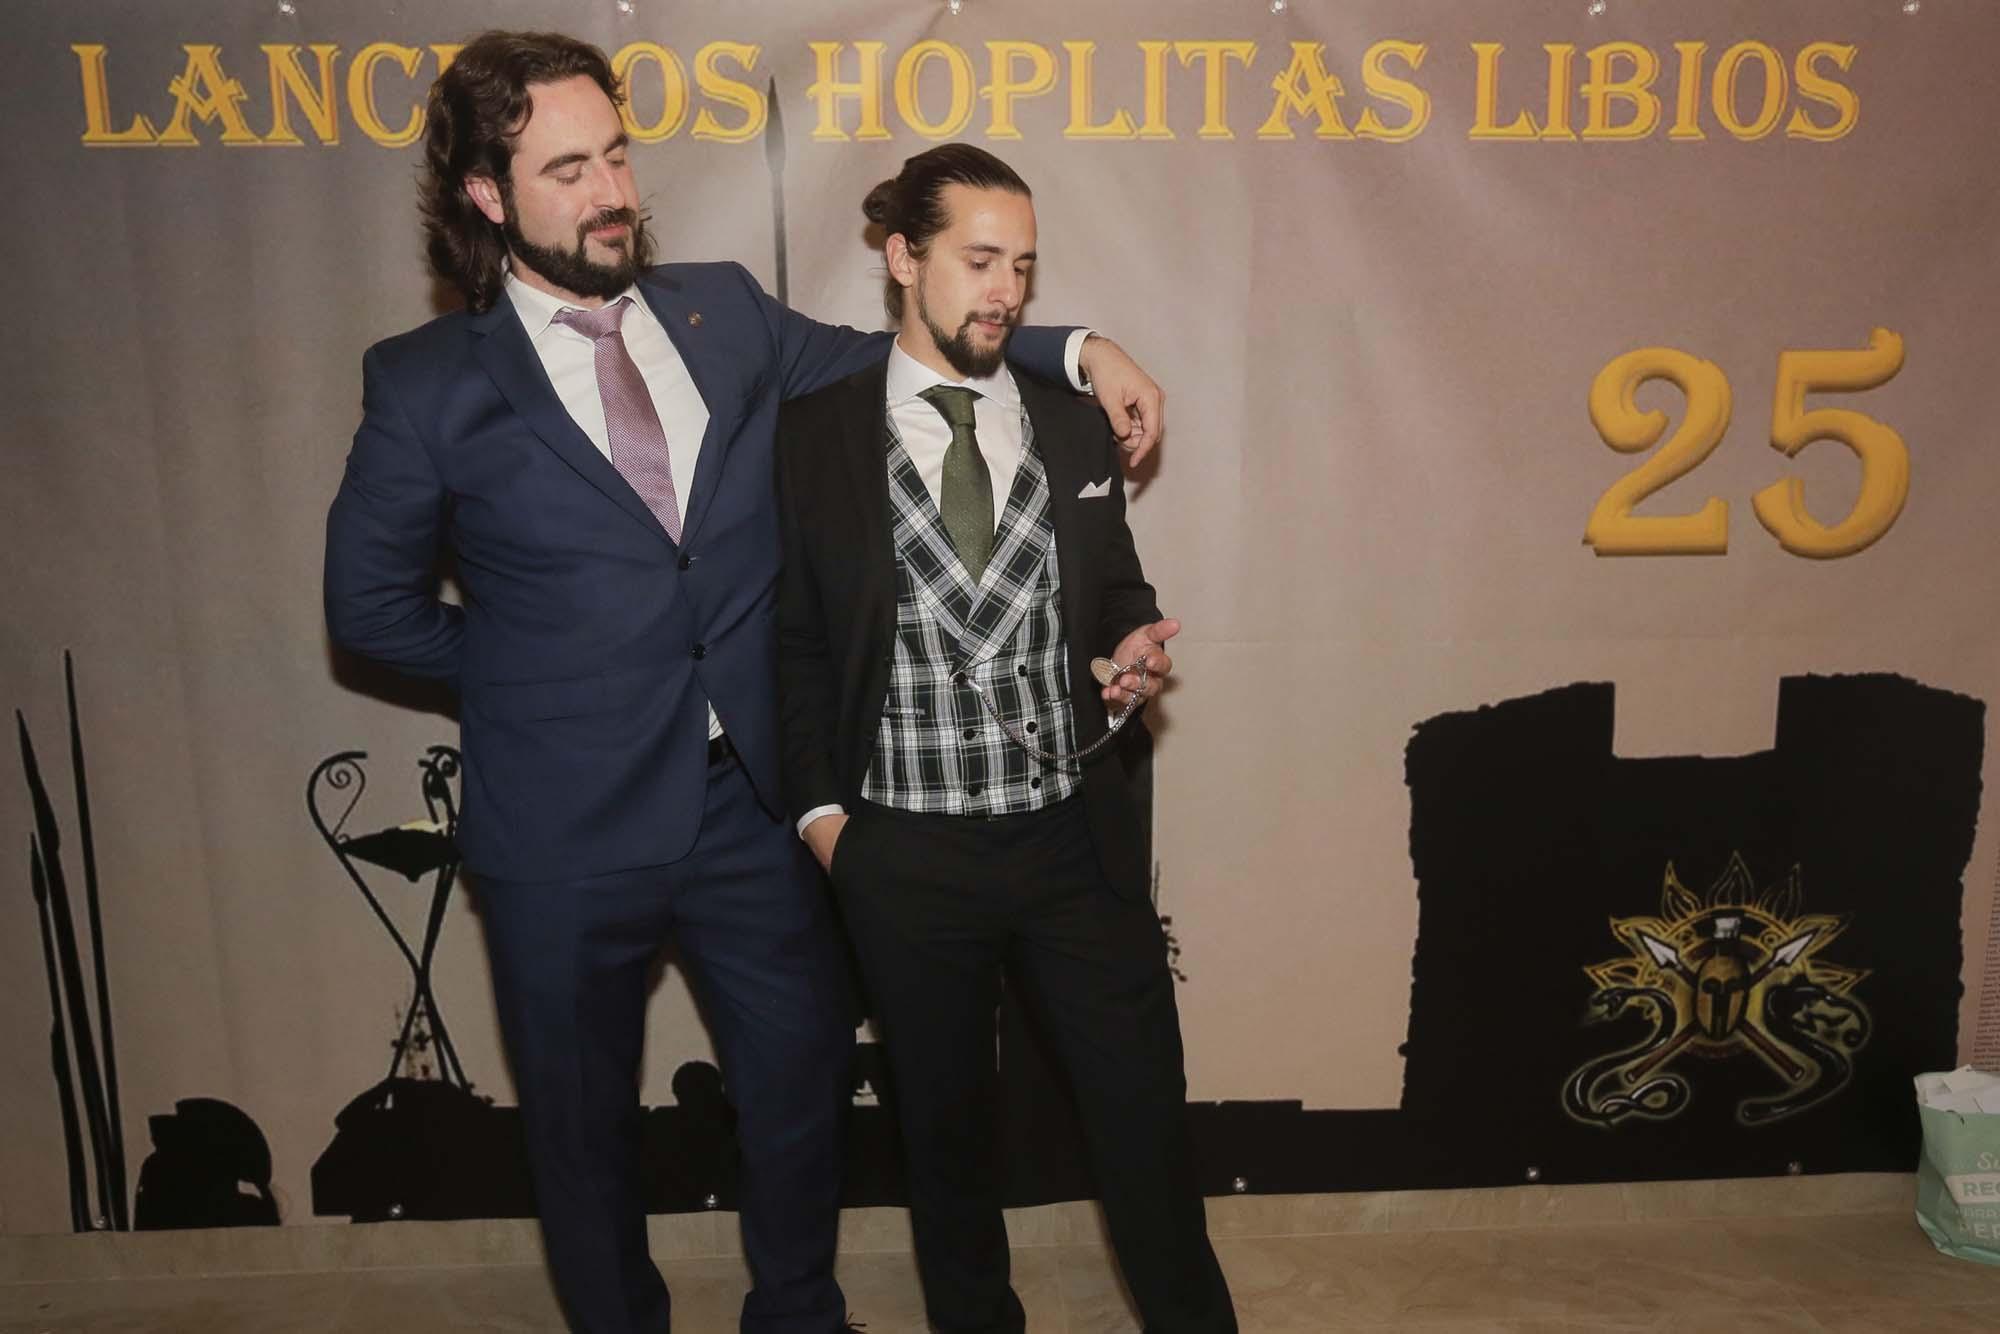 Lanceros Hoplitas Libios  (200)